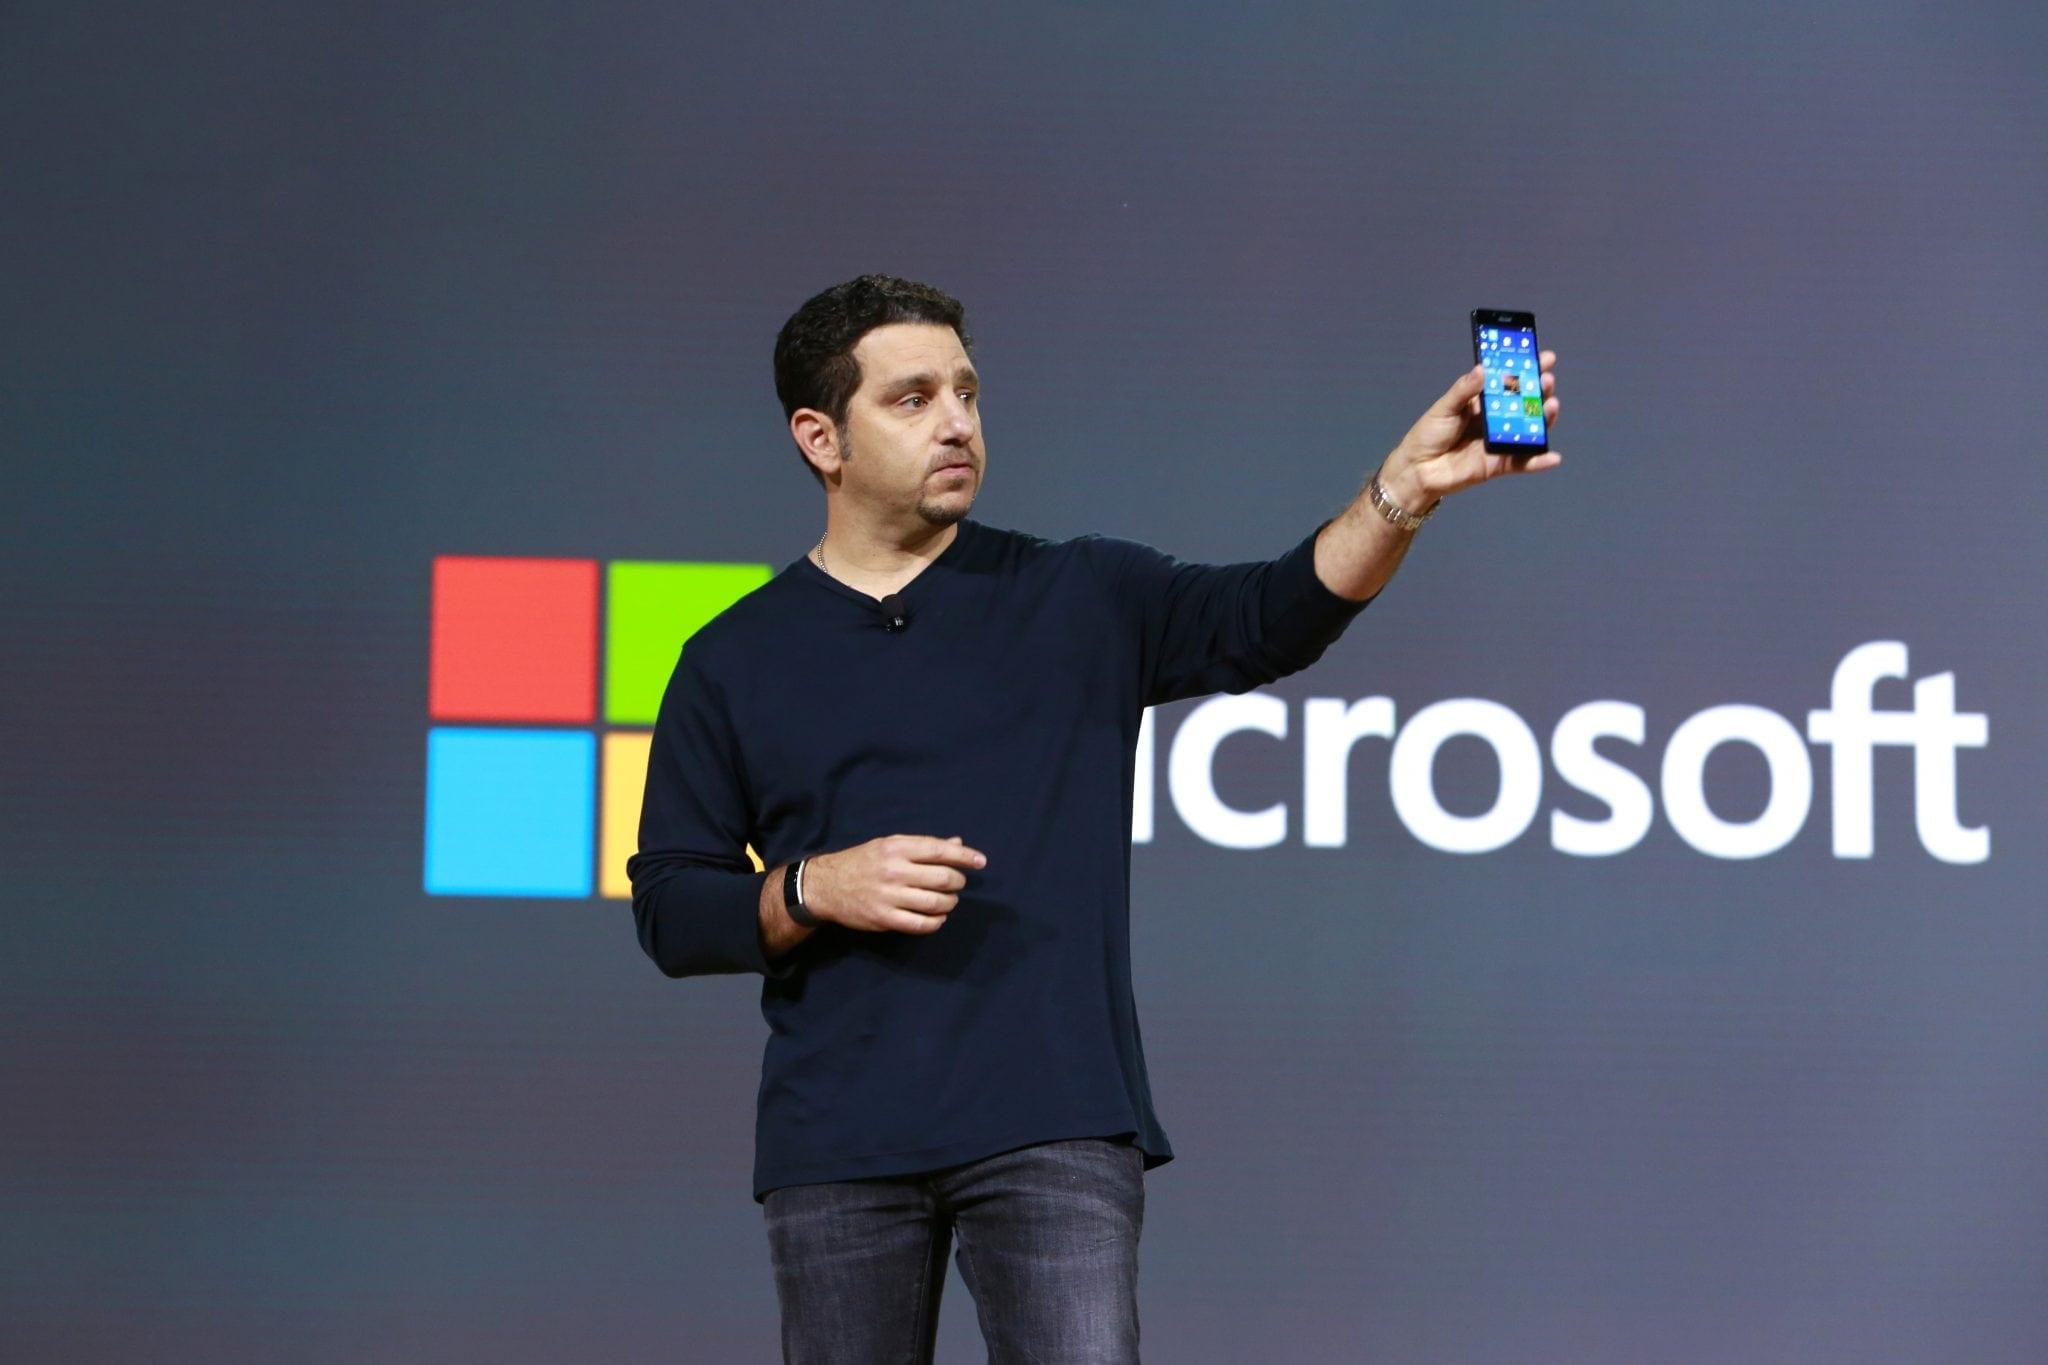 Microsoft a prezentat smartphone-urile Lumia 550, Lumia 950 și Lumia 950 XL